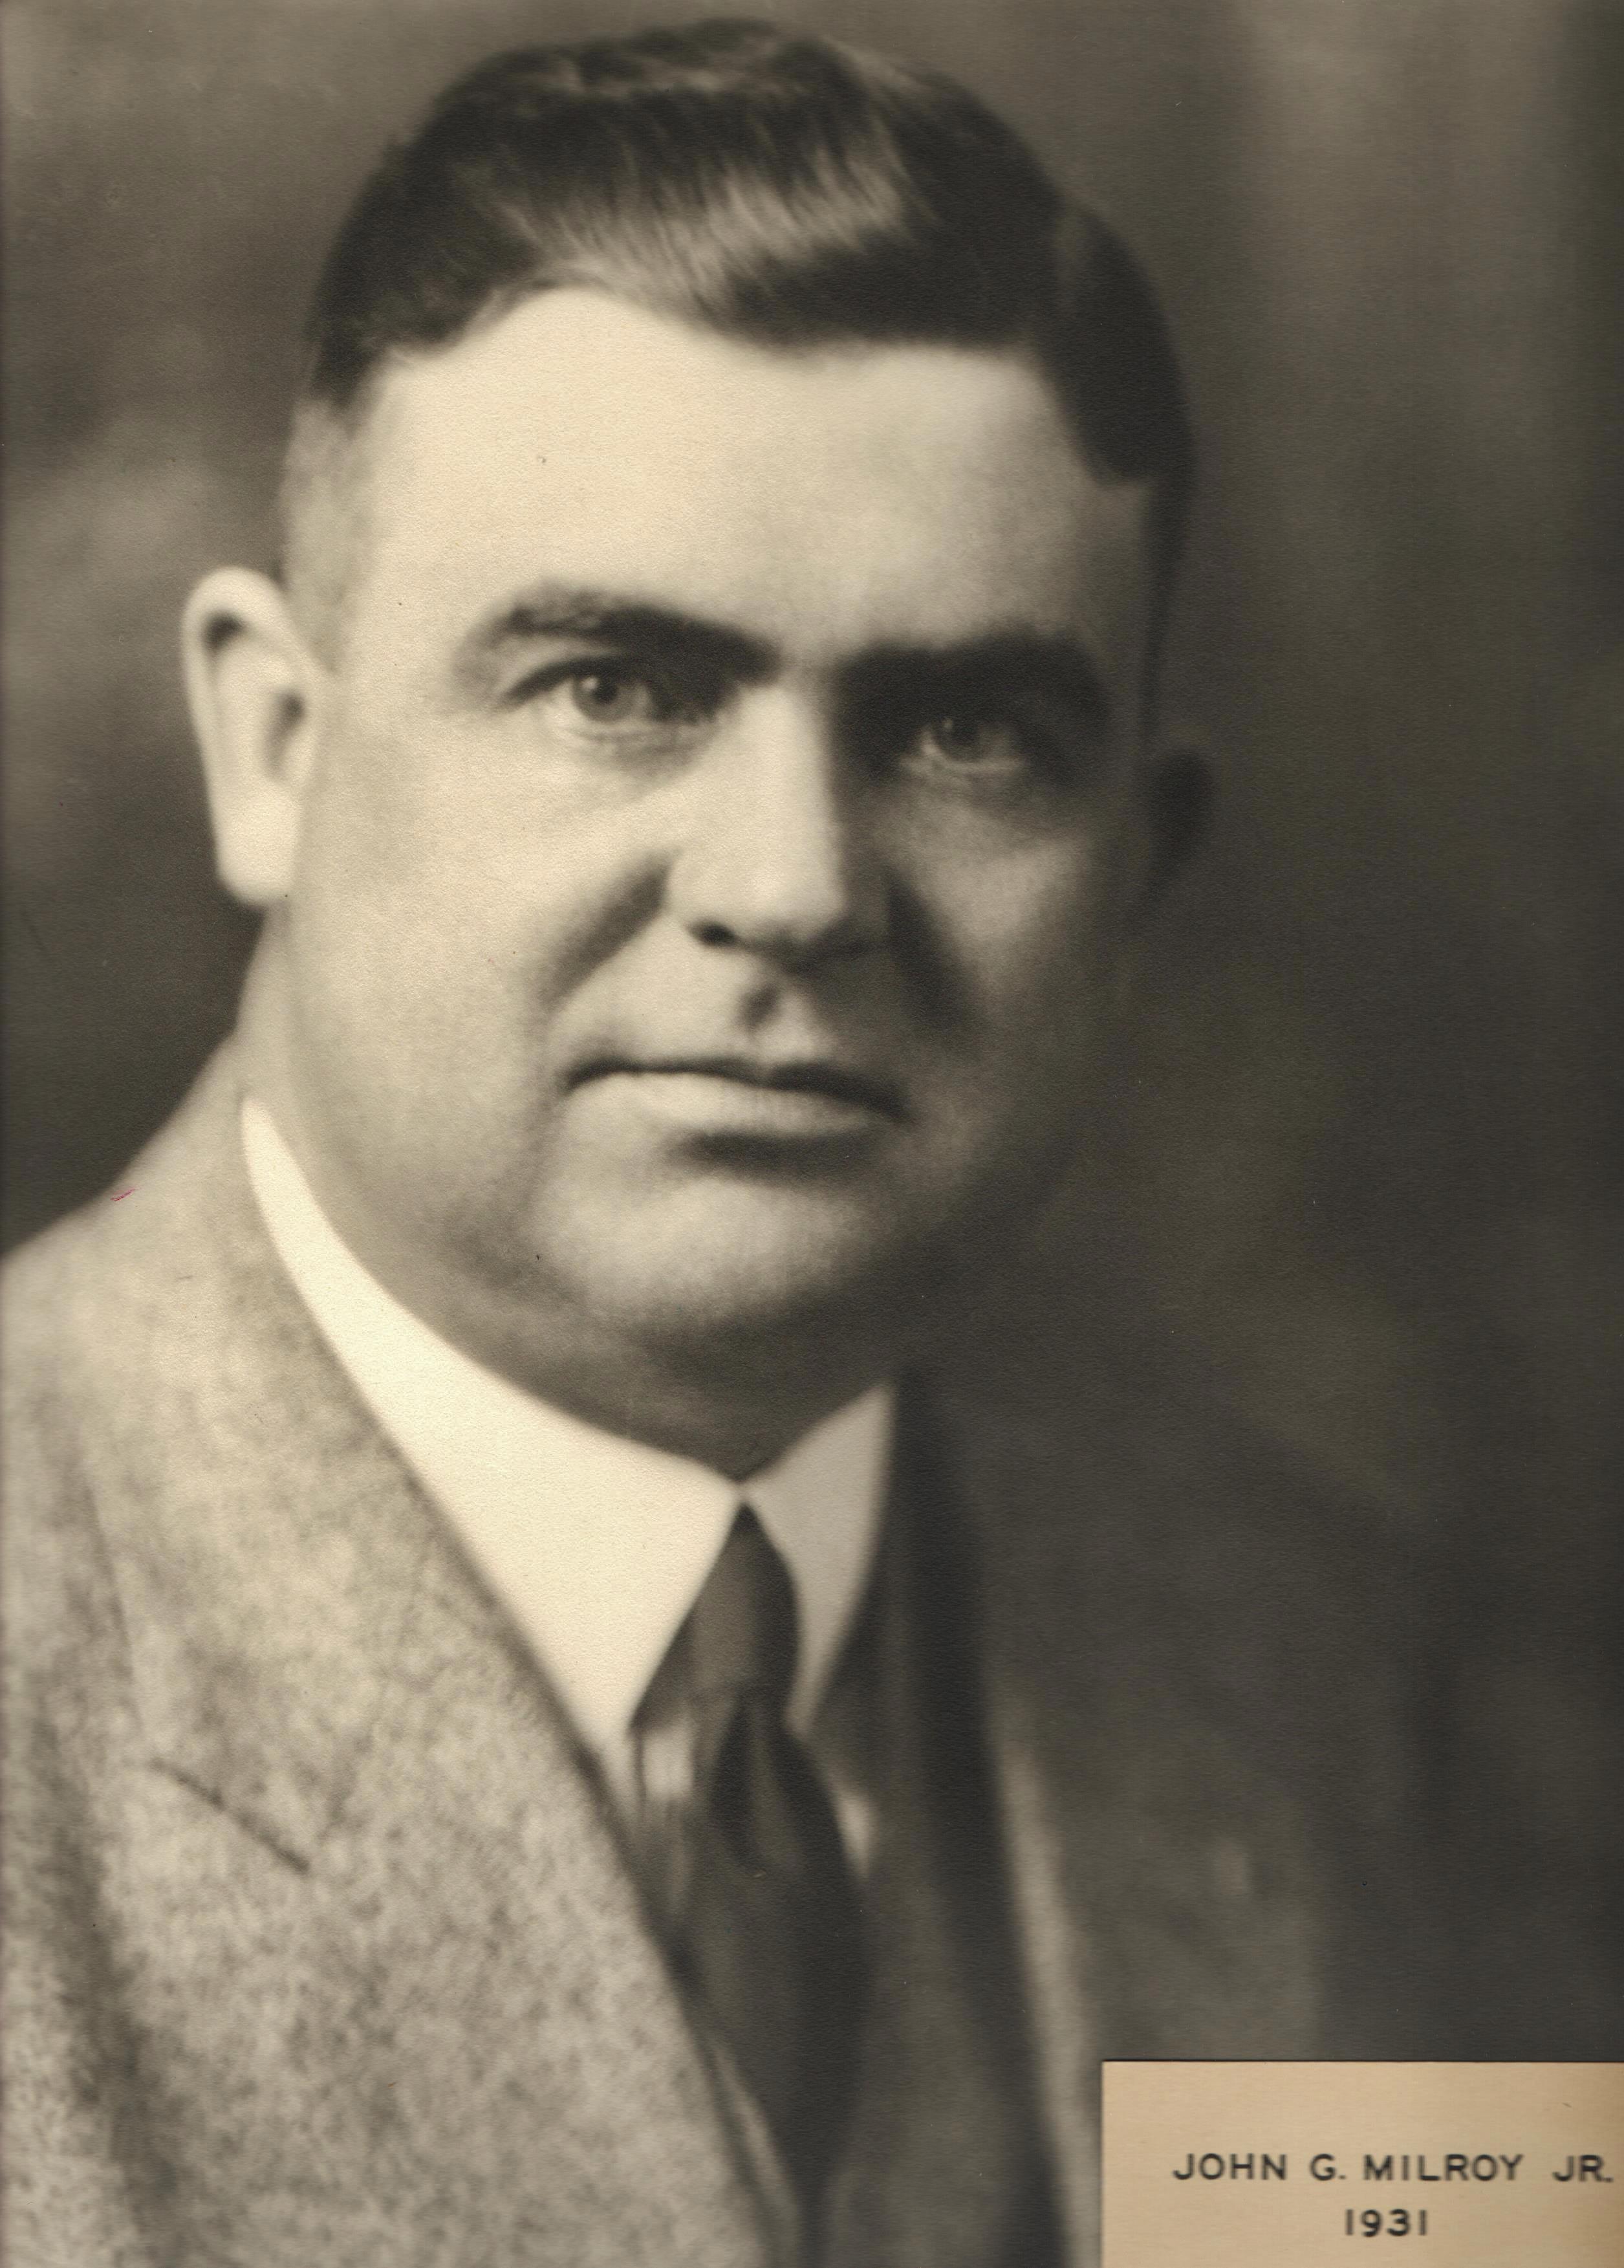 1931 John G. Milroy Jr.